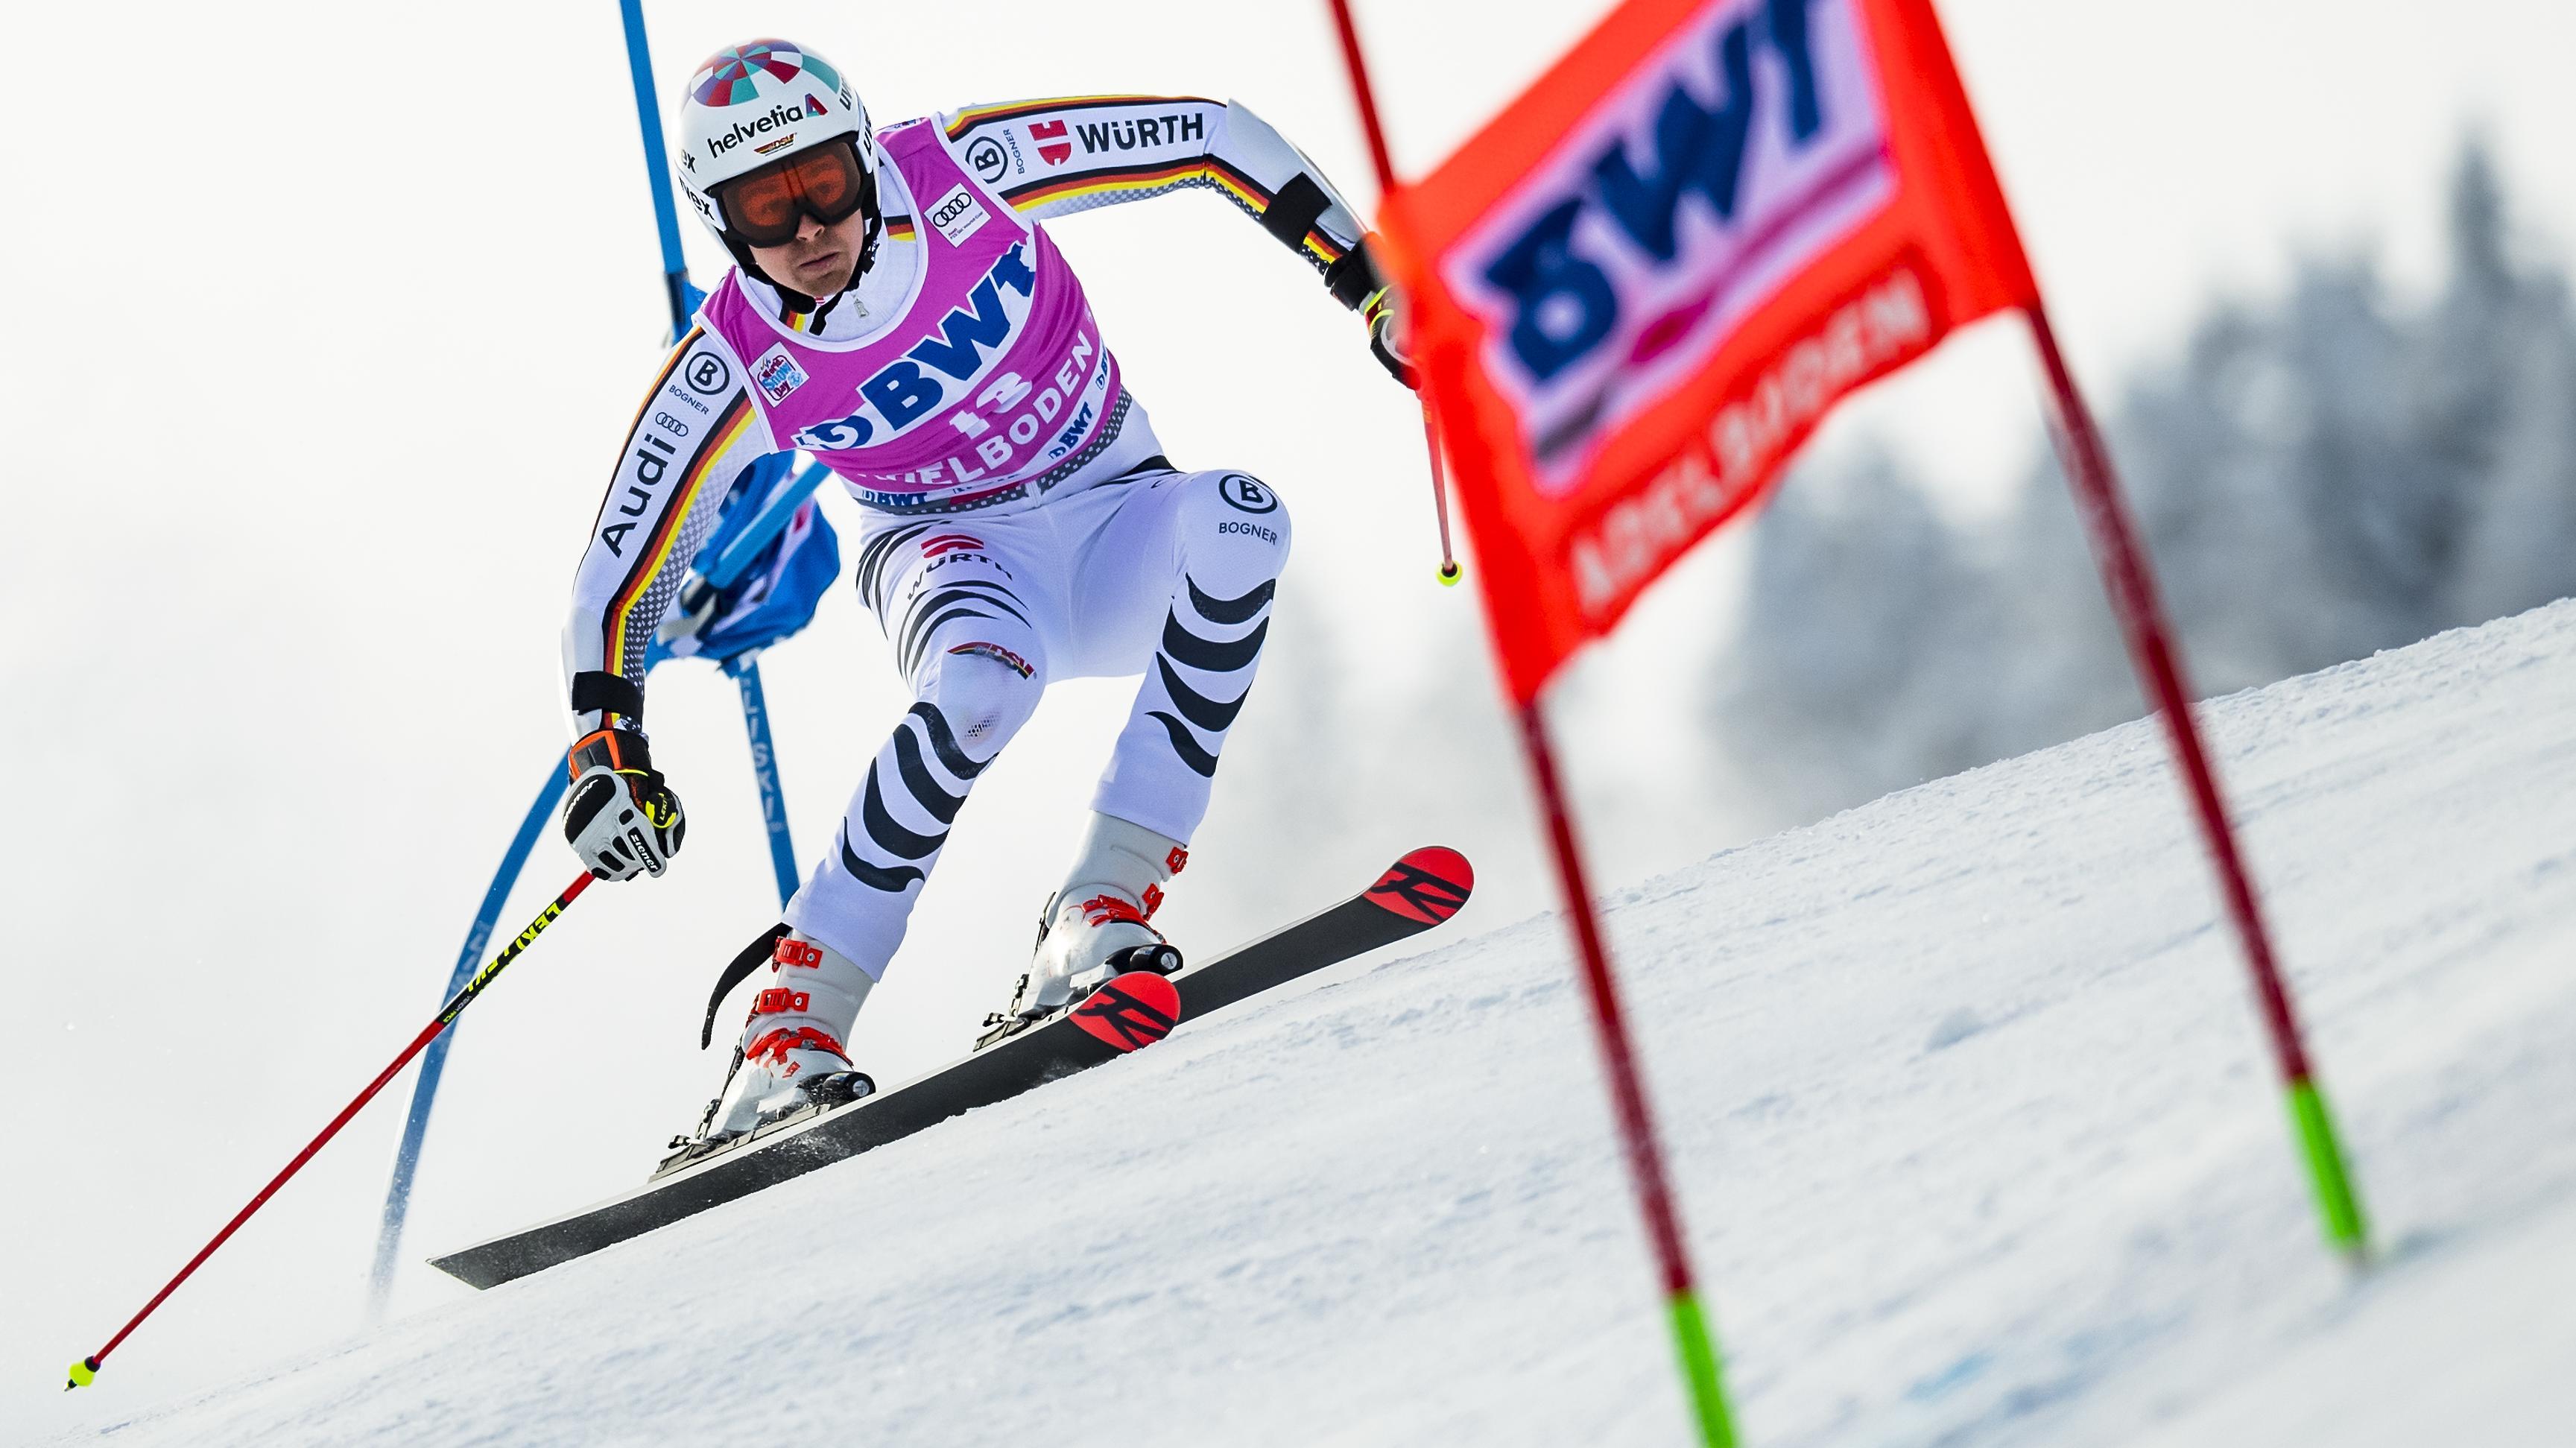 Skirennläufer Stefan Luitz